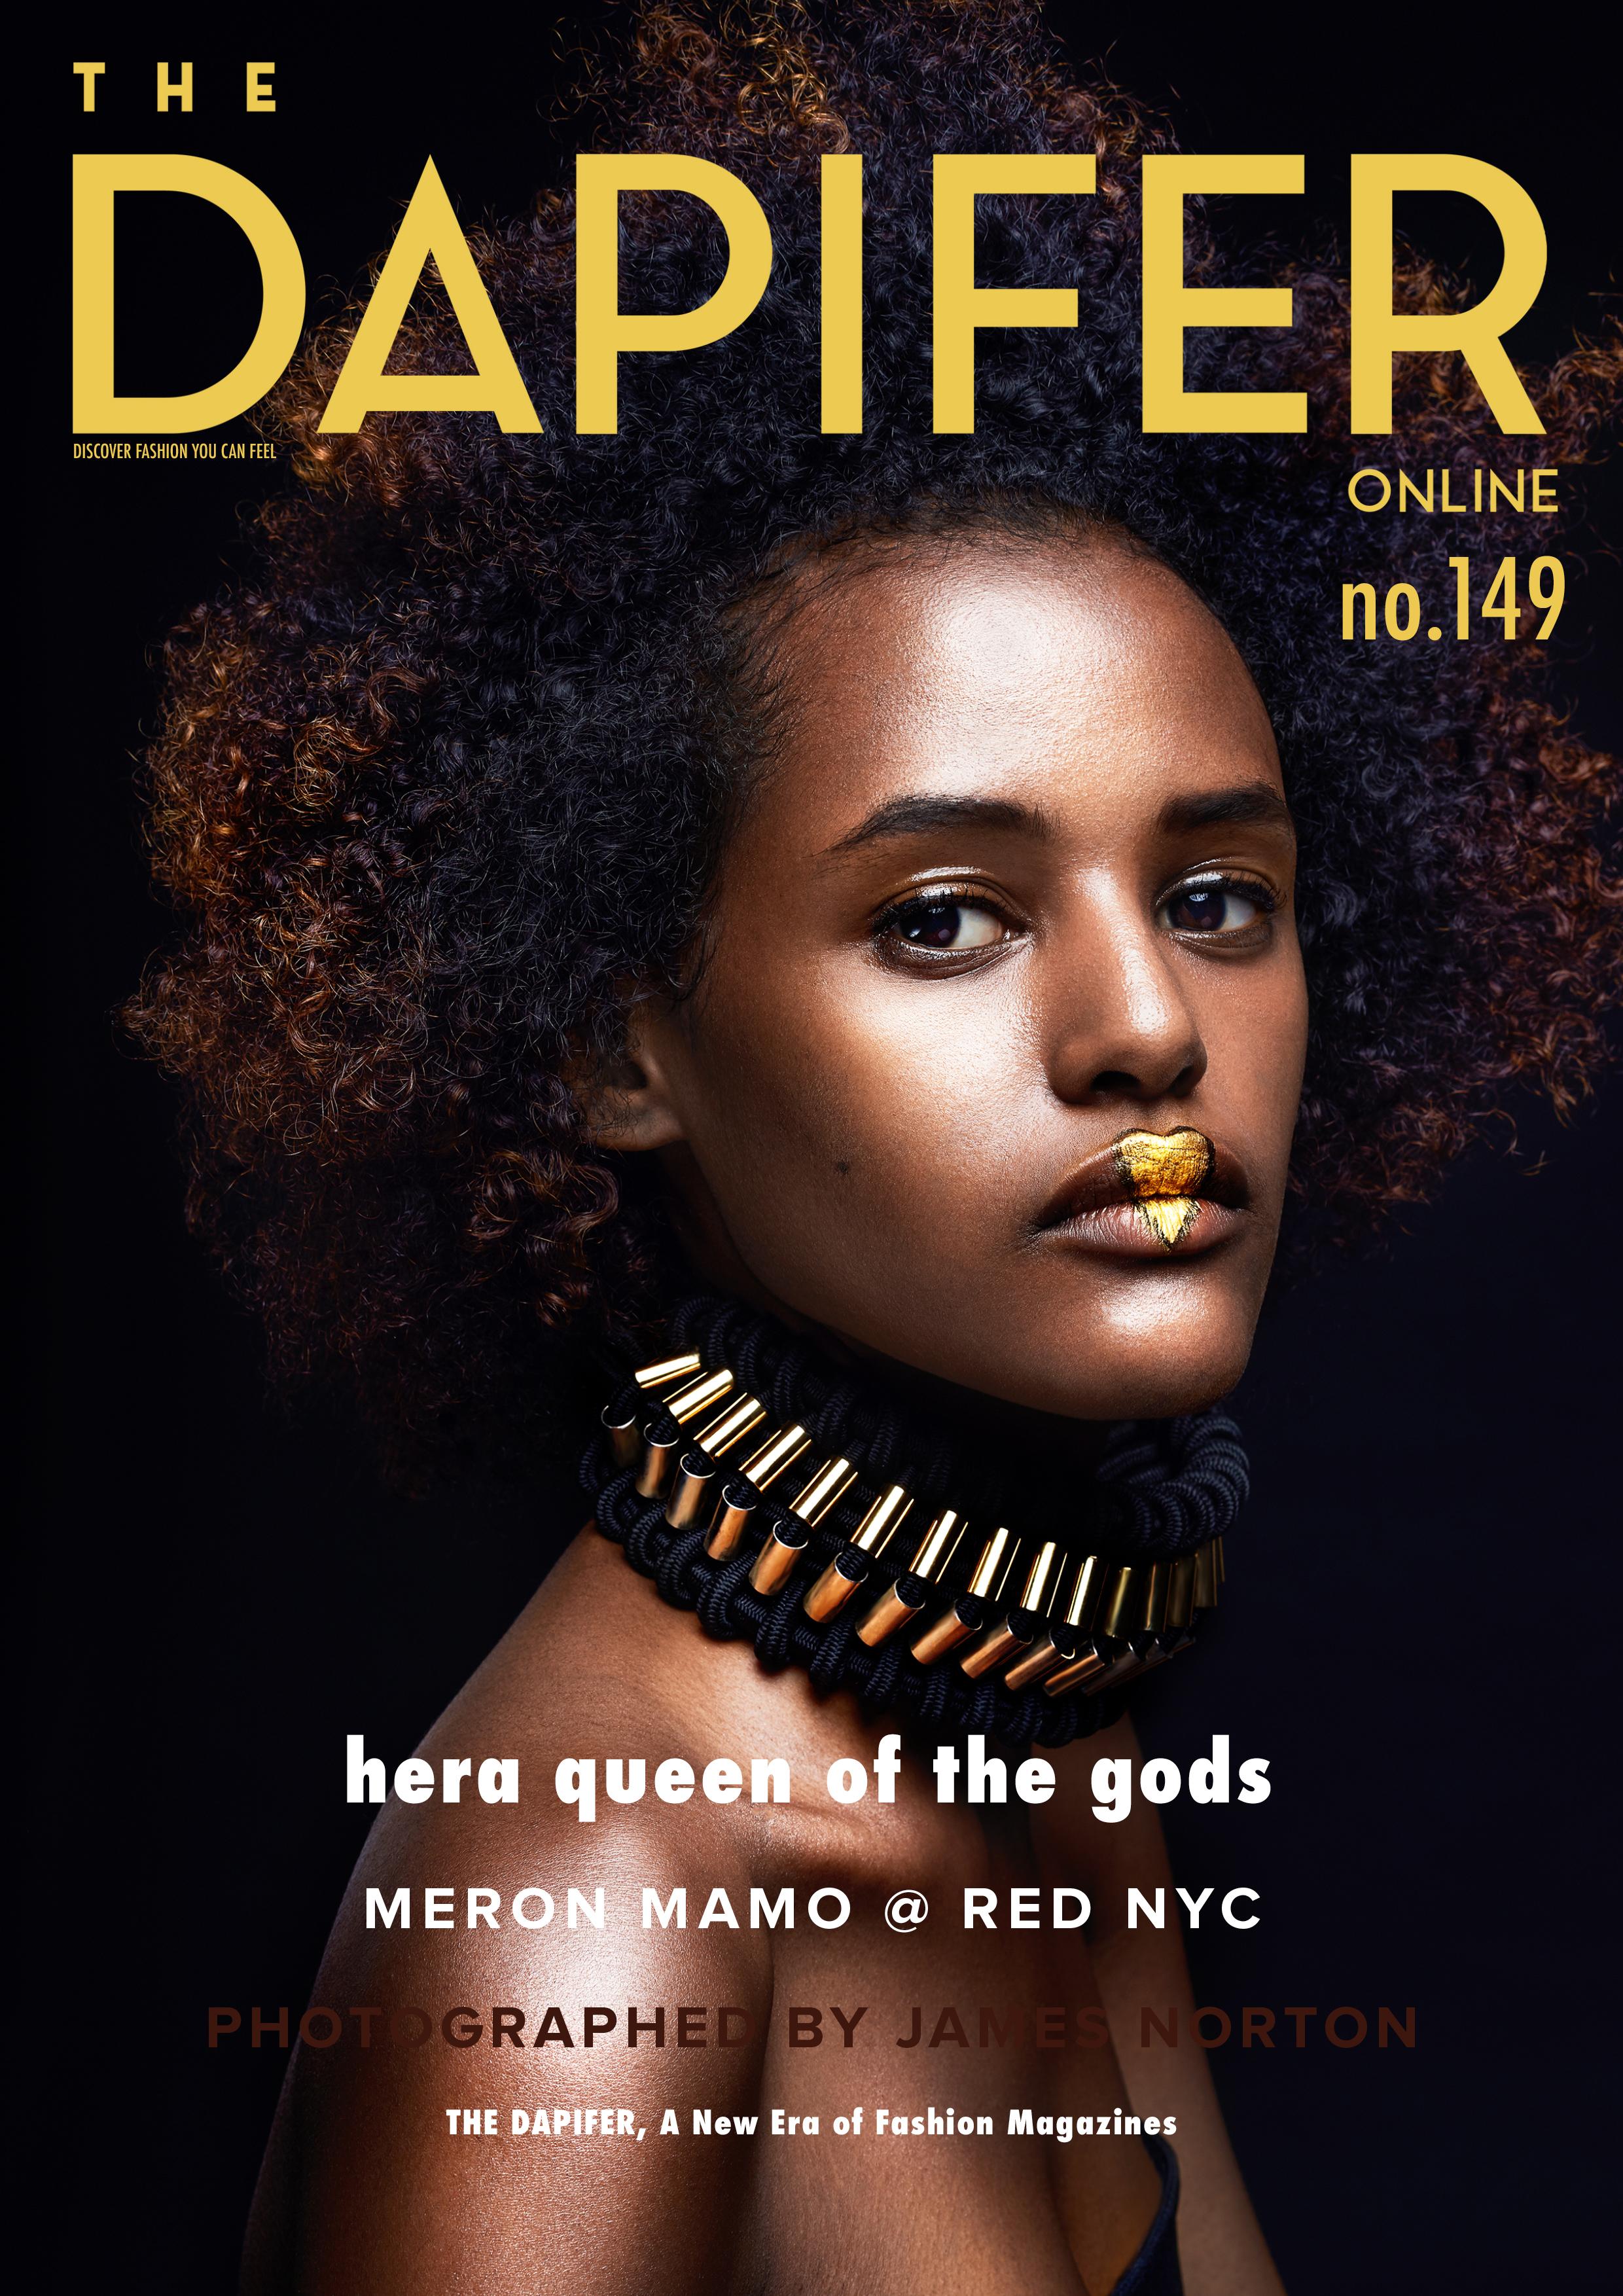 Meron Mamo by Photographer James Norton Fashion Editorial - The Dapifer.jpg